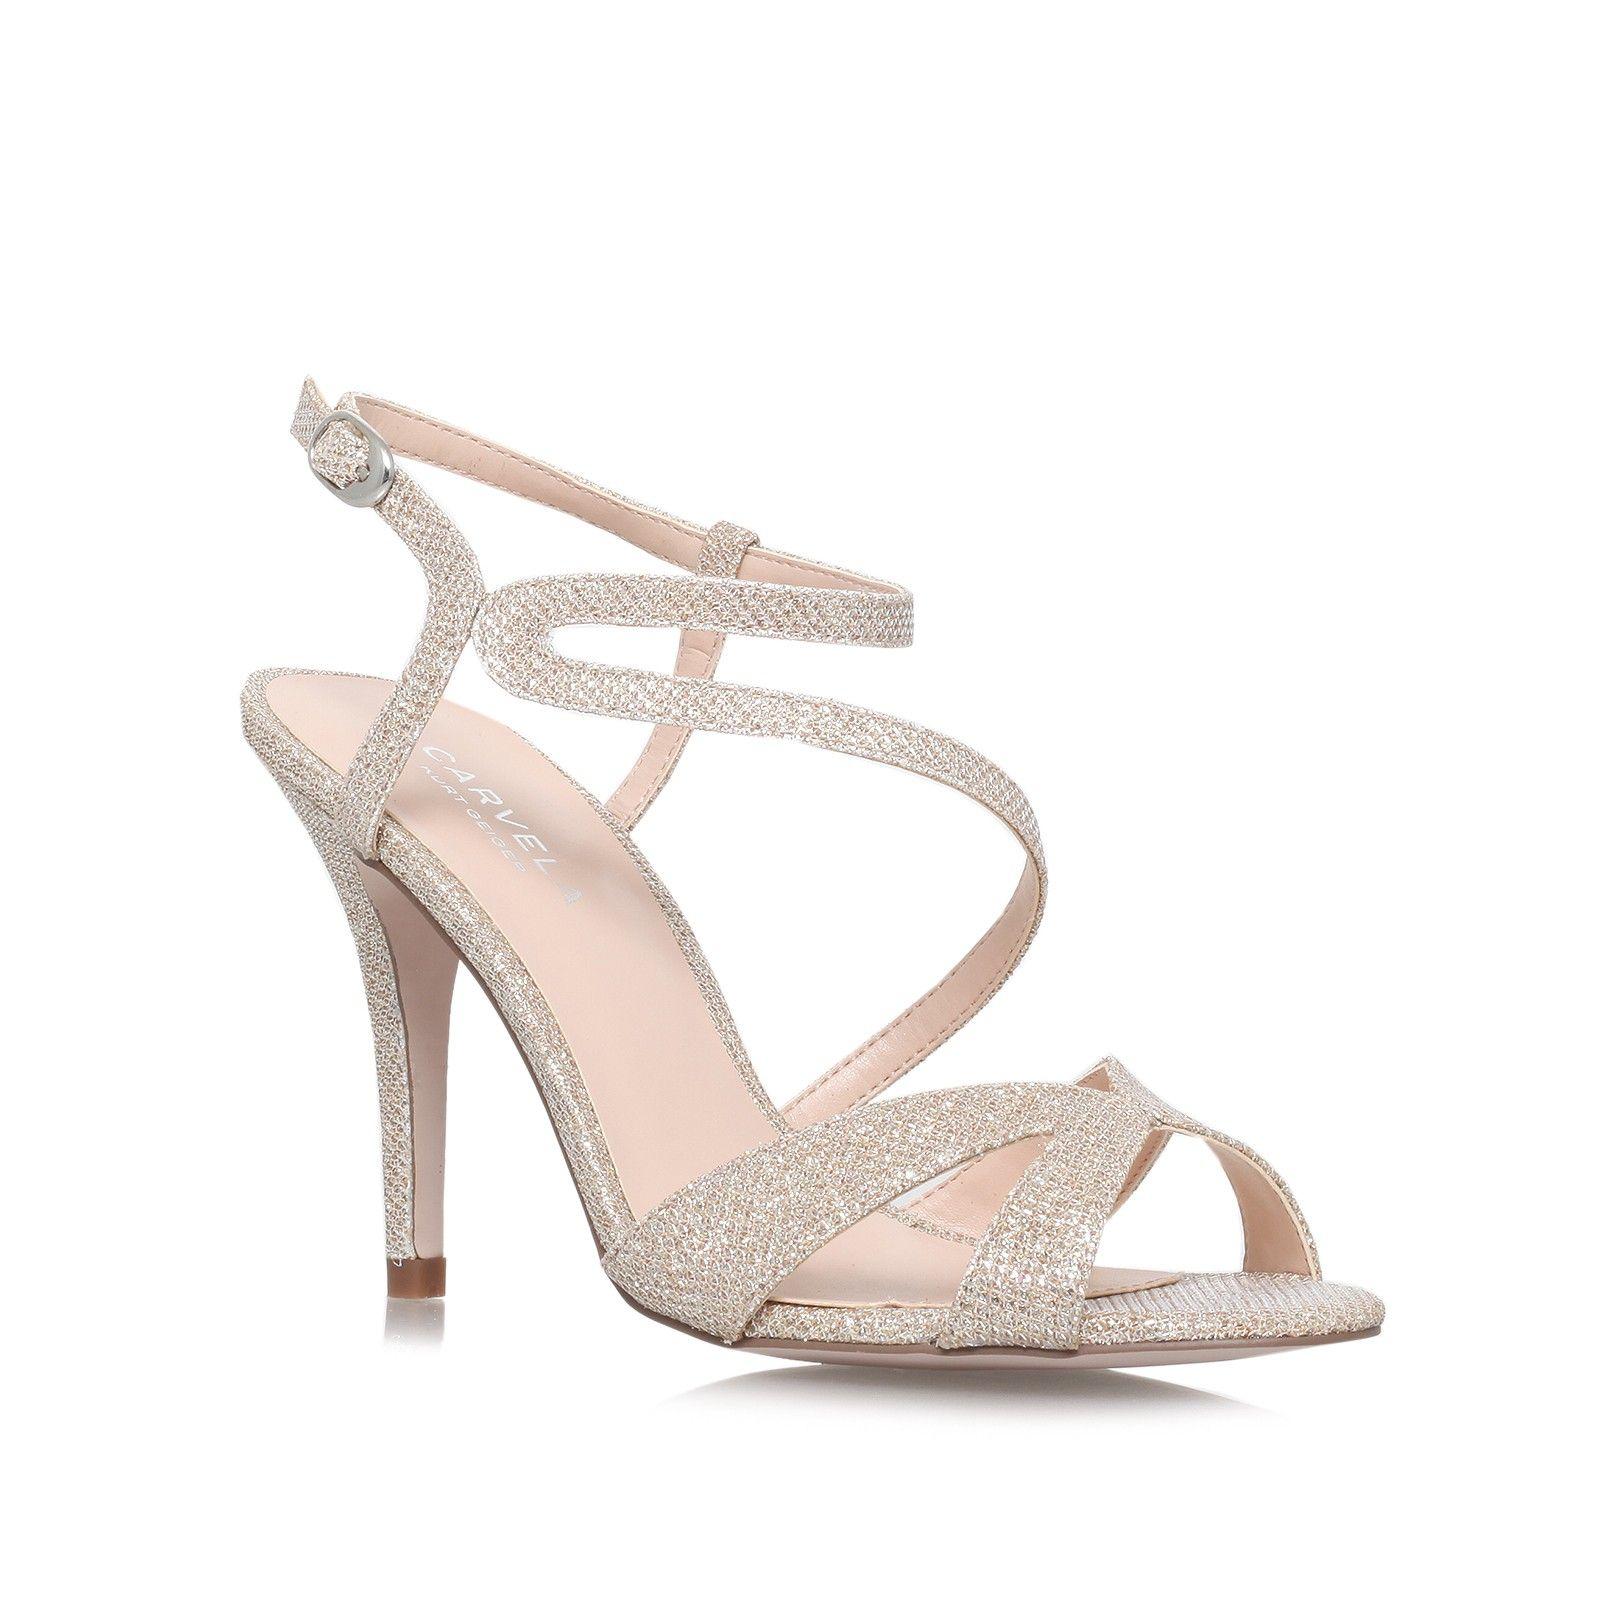 c67384efb10f ladybird gold mid heel sandals from Carvela Kurt Geiger